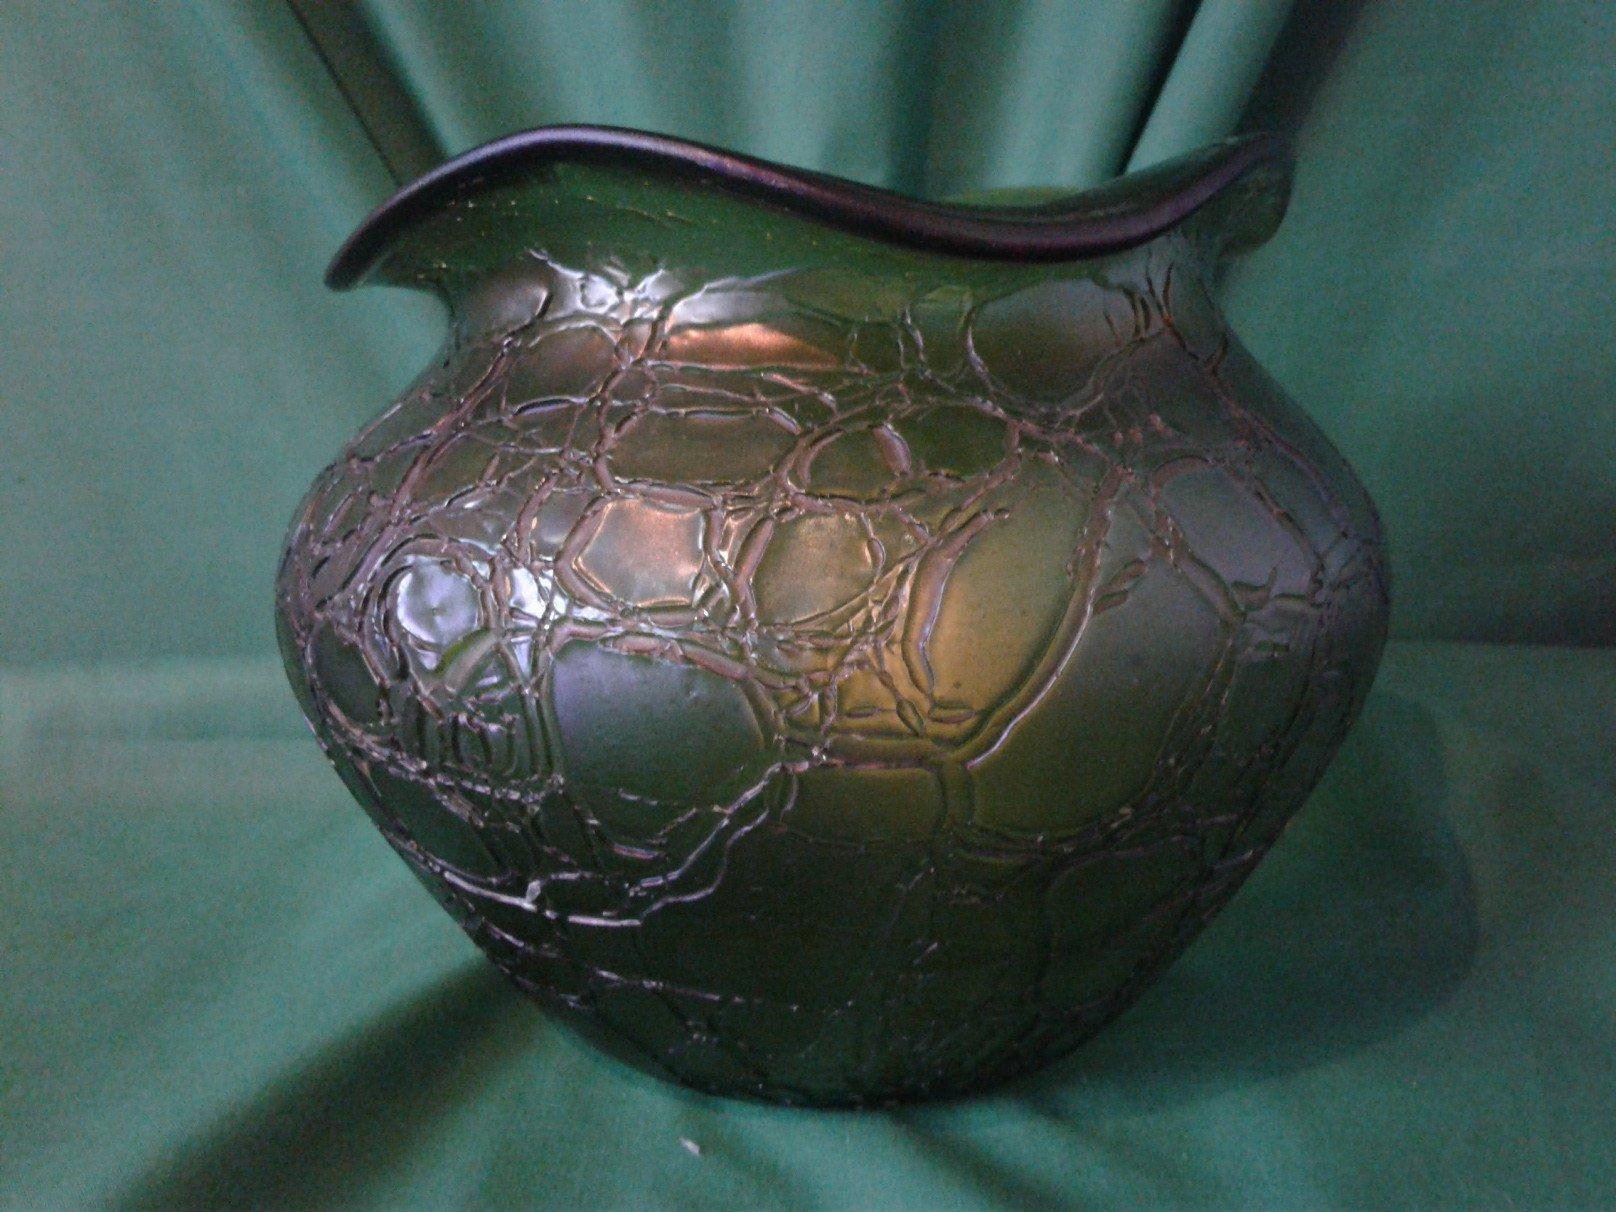 Fine Loetz iridecent bowl circa 1900s